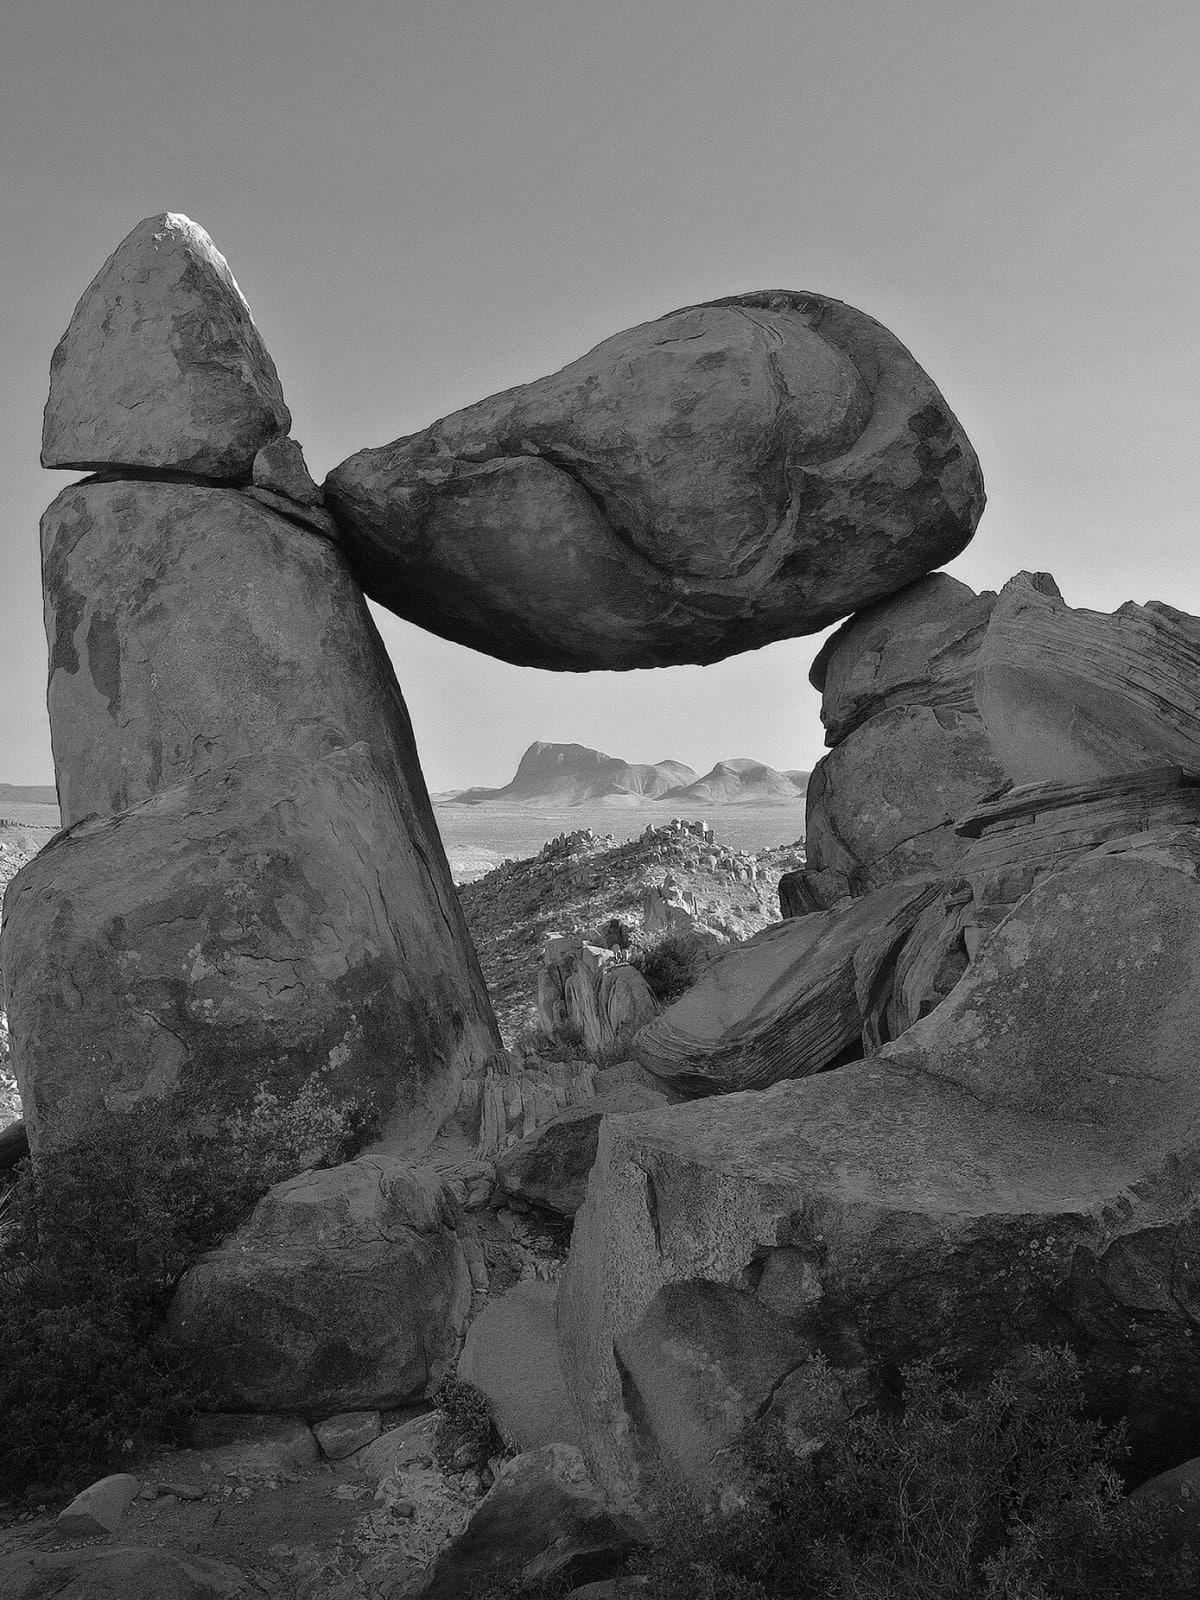 Mark Burns photo of Balanced Rock at Big Bend National Park